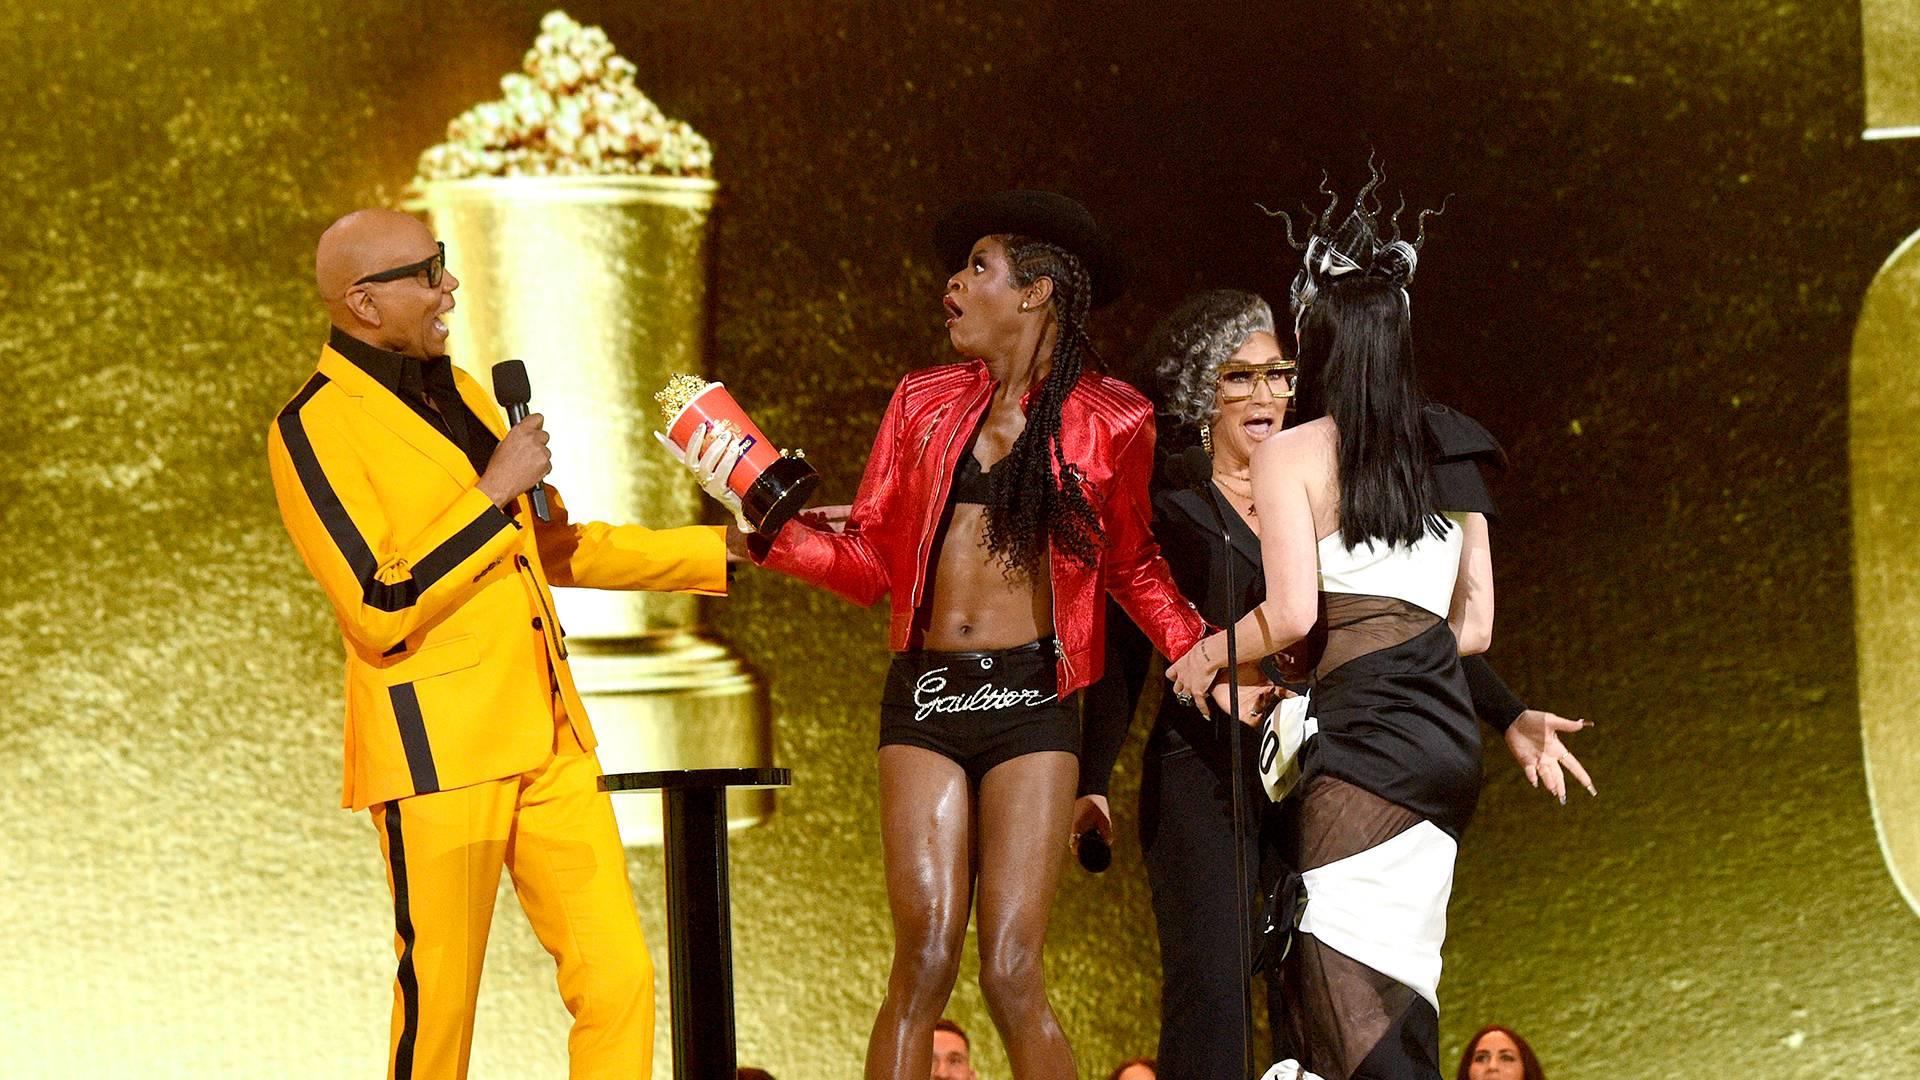 MTV Movie & TV Awards: UNSCRIPTED 2021 | Highlights Gallery | RuPaul, Symone and Gottmik | 1920x1080